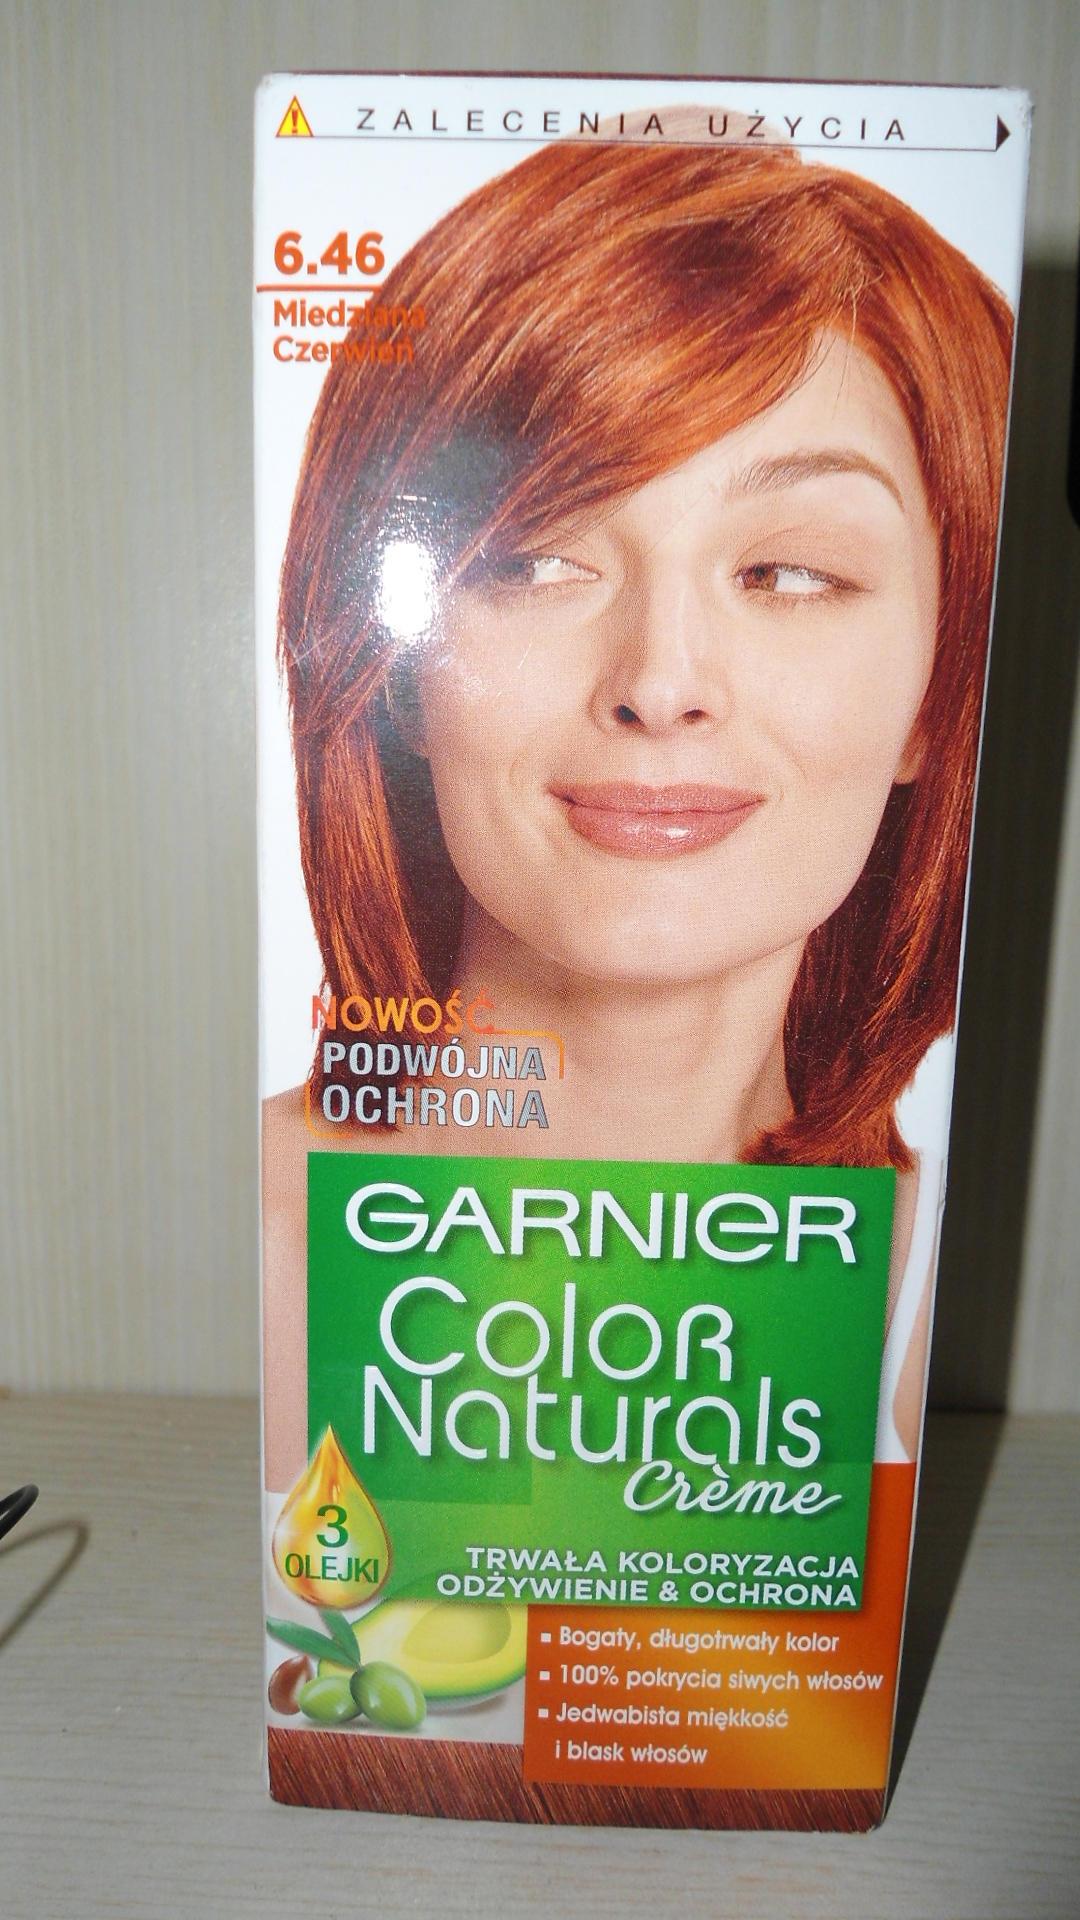 Garnier Color Naturals. Wszystkie kolory